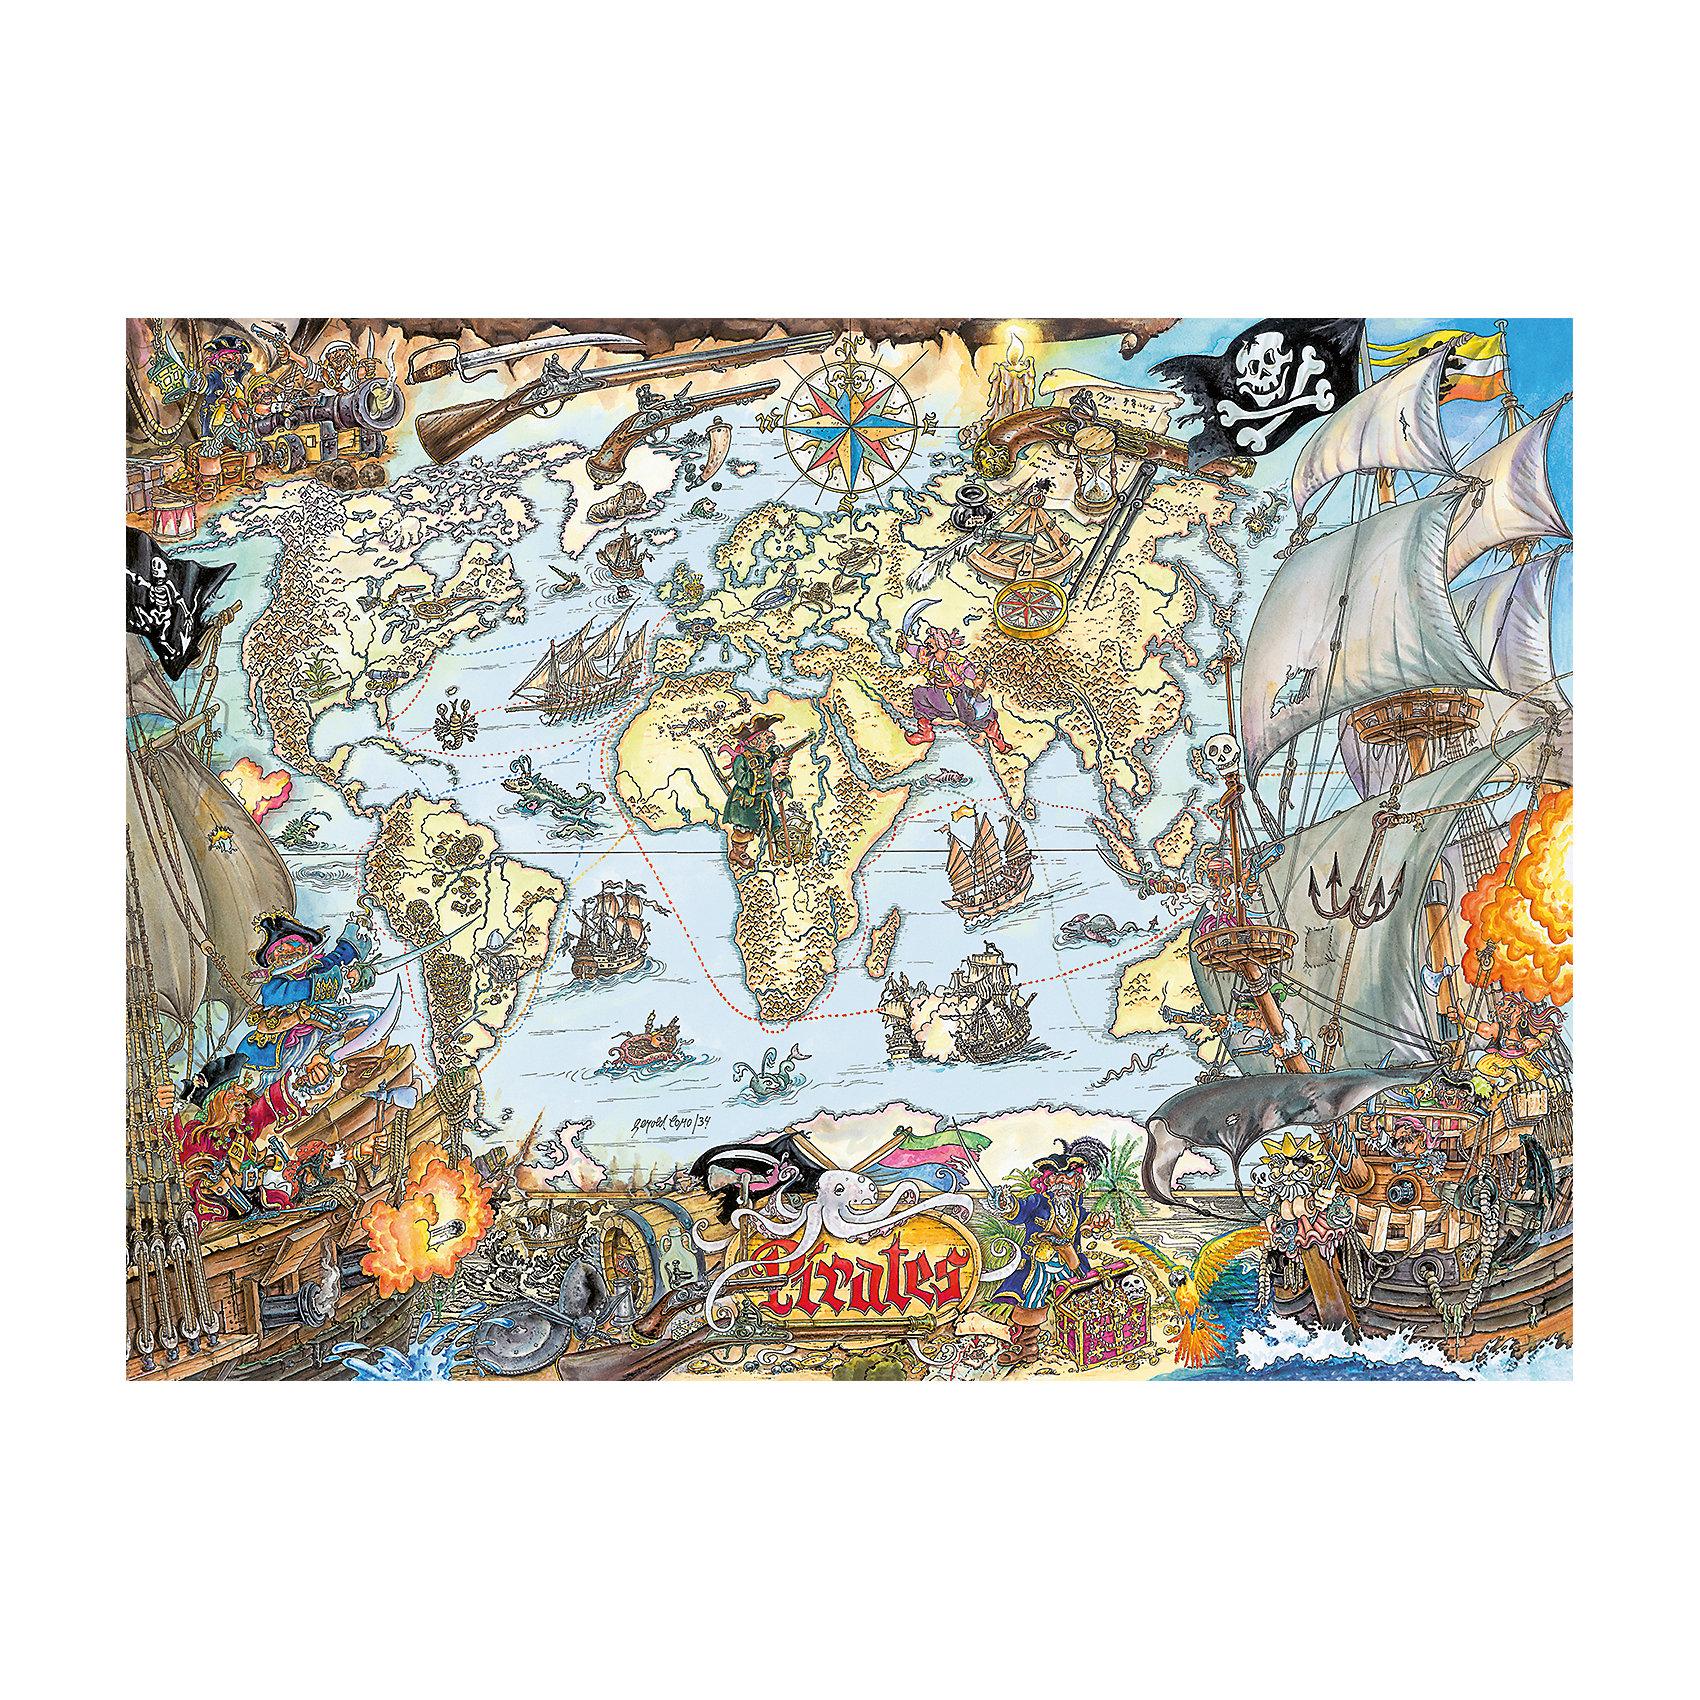 Пазл «Пиратская карта» XXL 200 шт от myToys